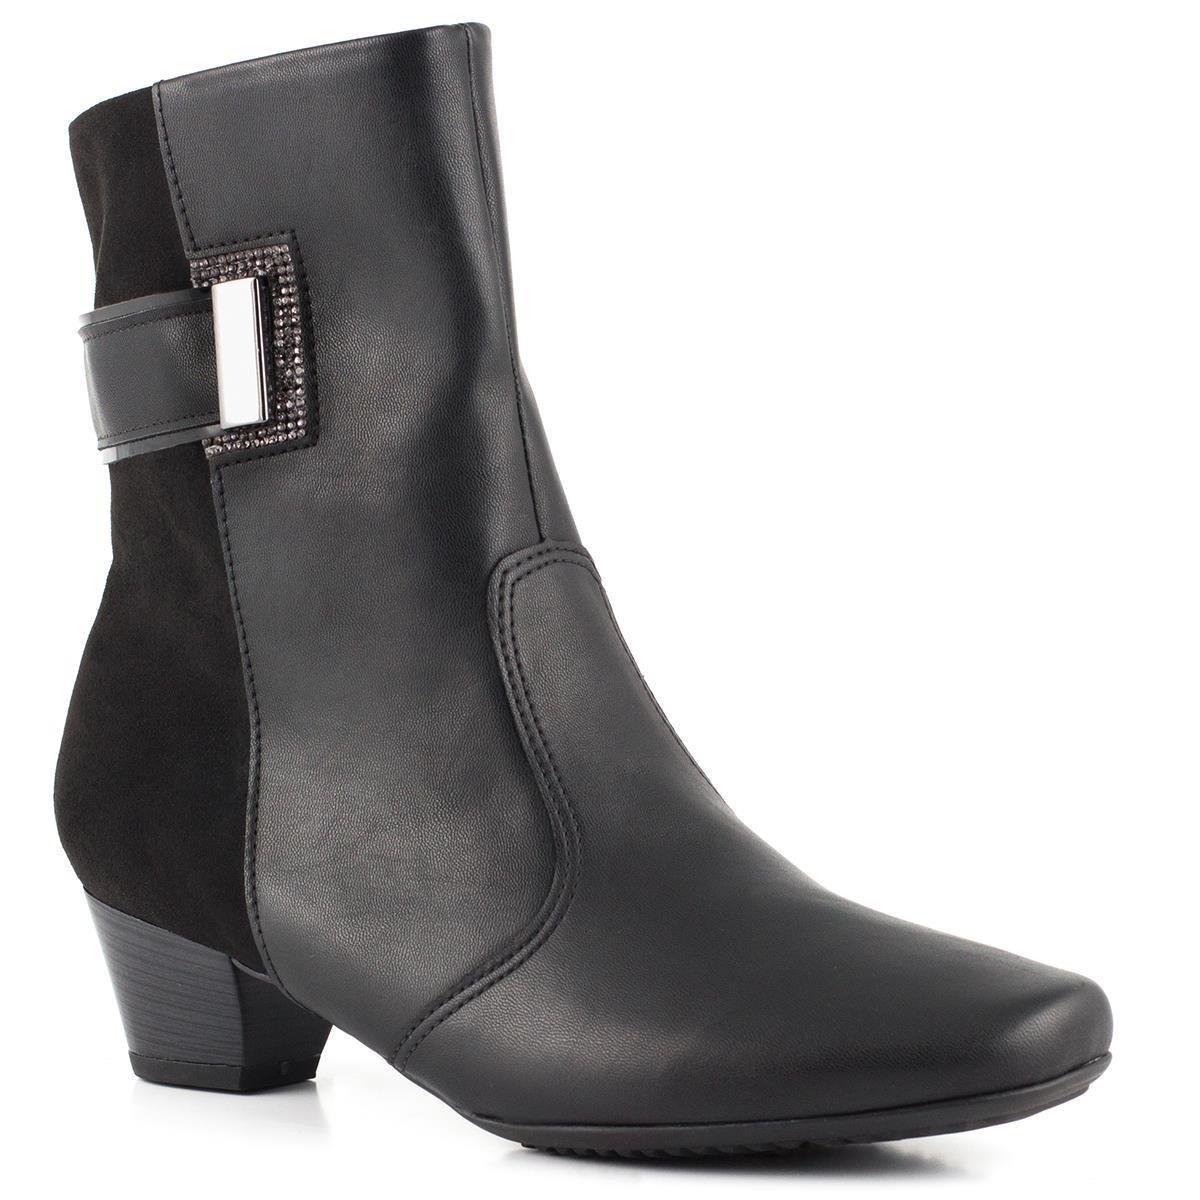 00c2c5dc2d3f Bota Ankle Boot Piccadilly MaxiTherapy 320249 - Preto (Microfibra ...